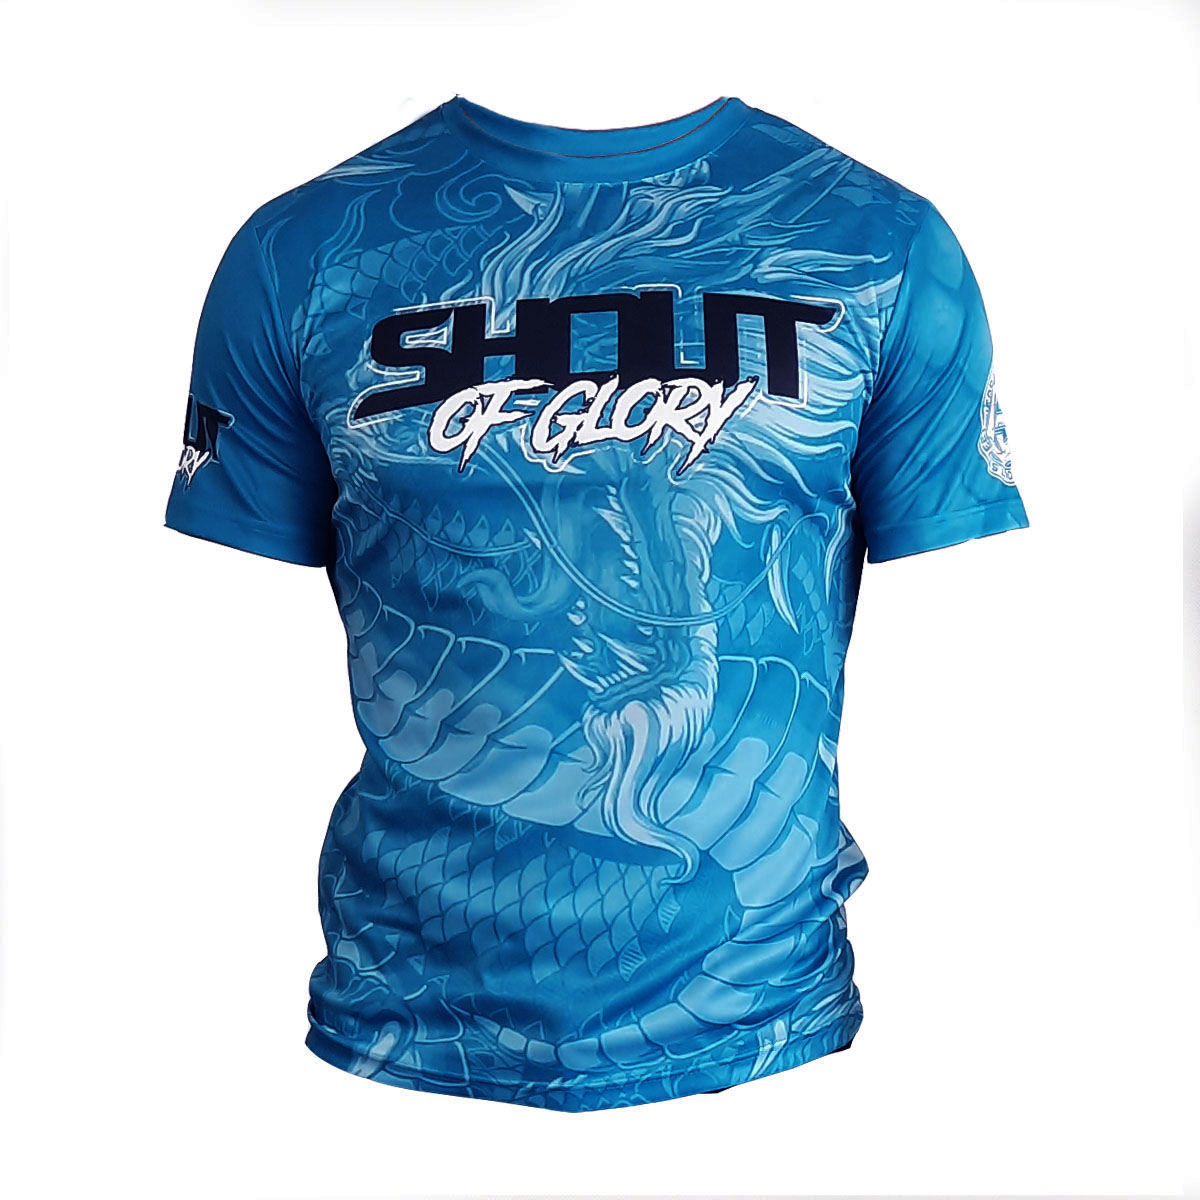 SHOUT T-SHIRT BLUE DRAGON